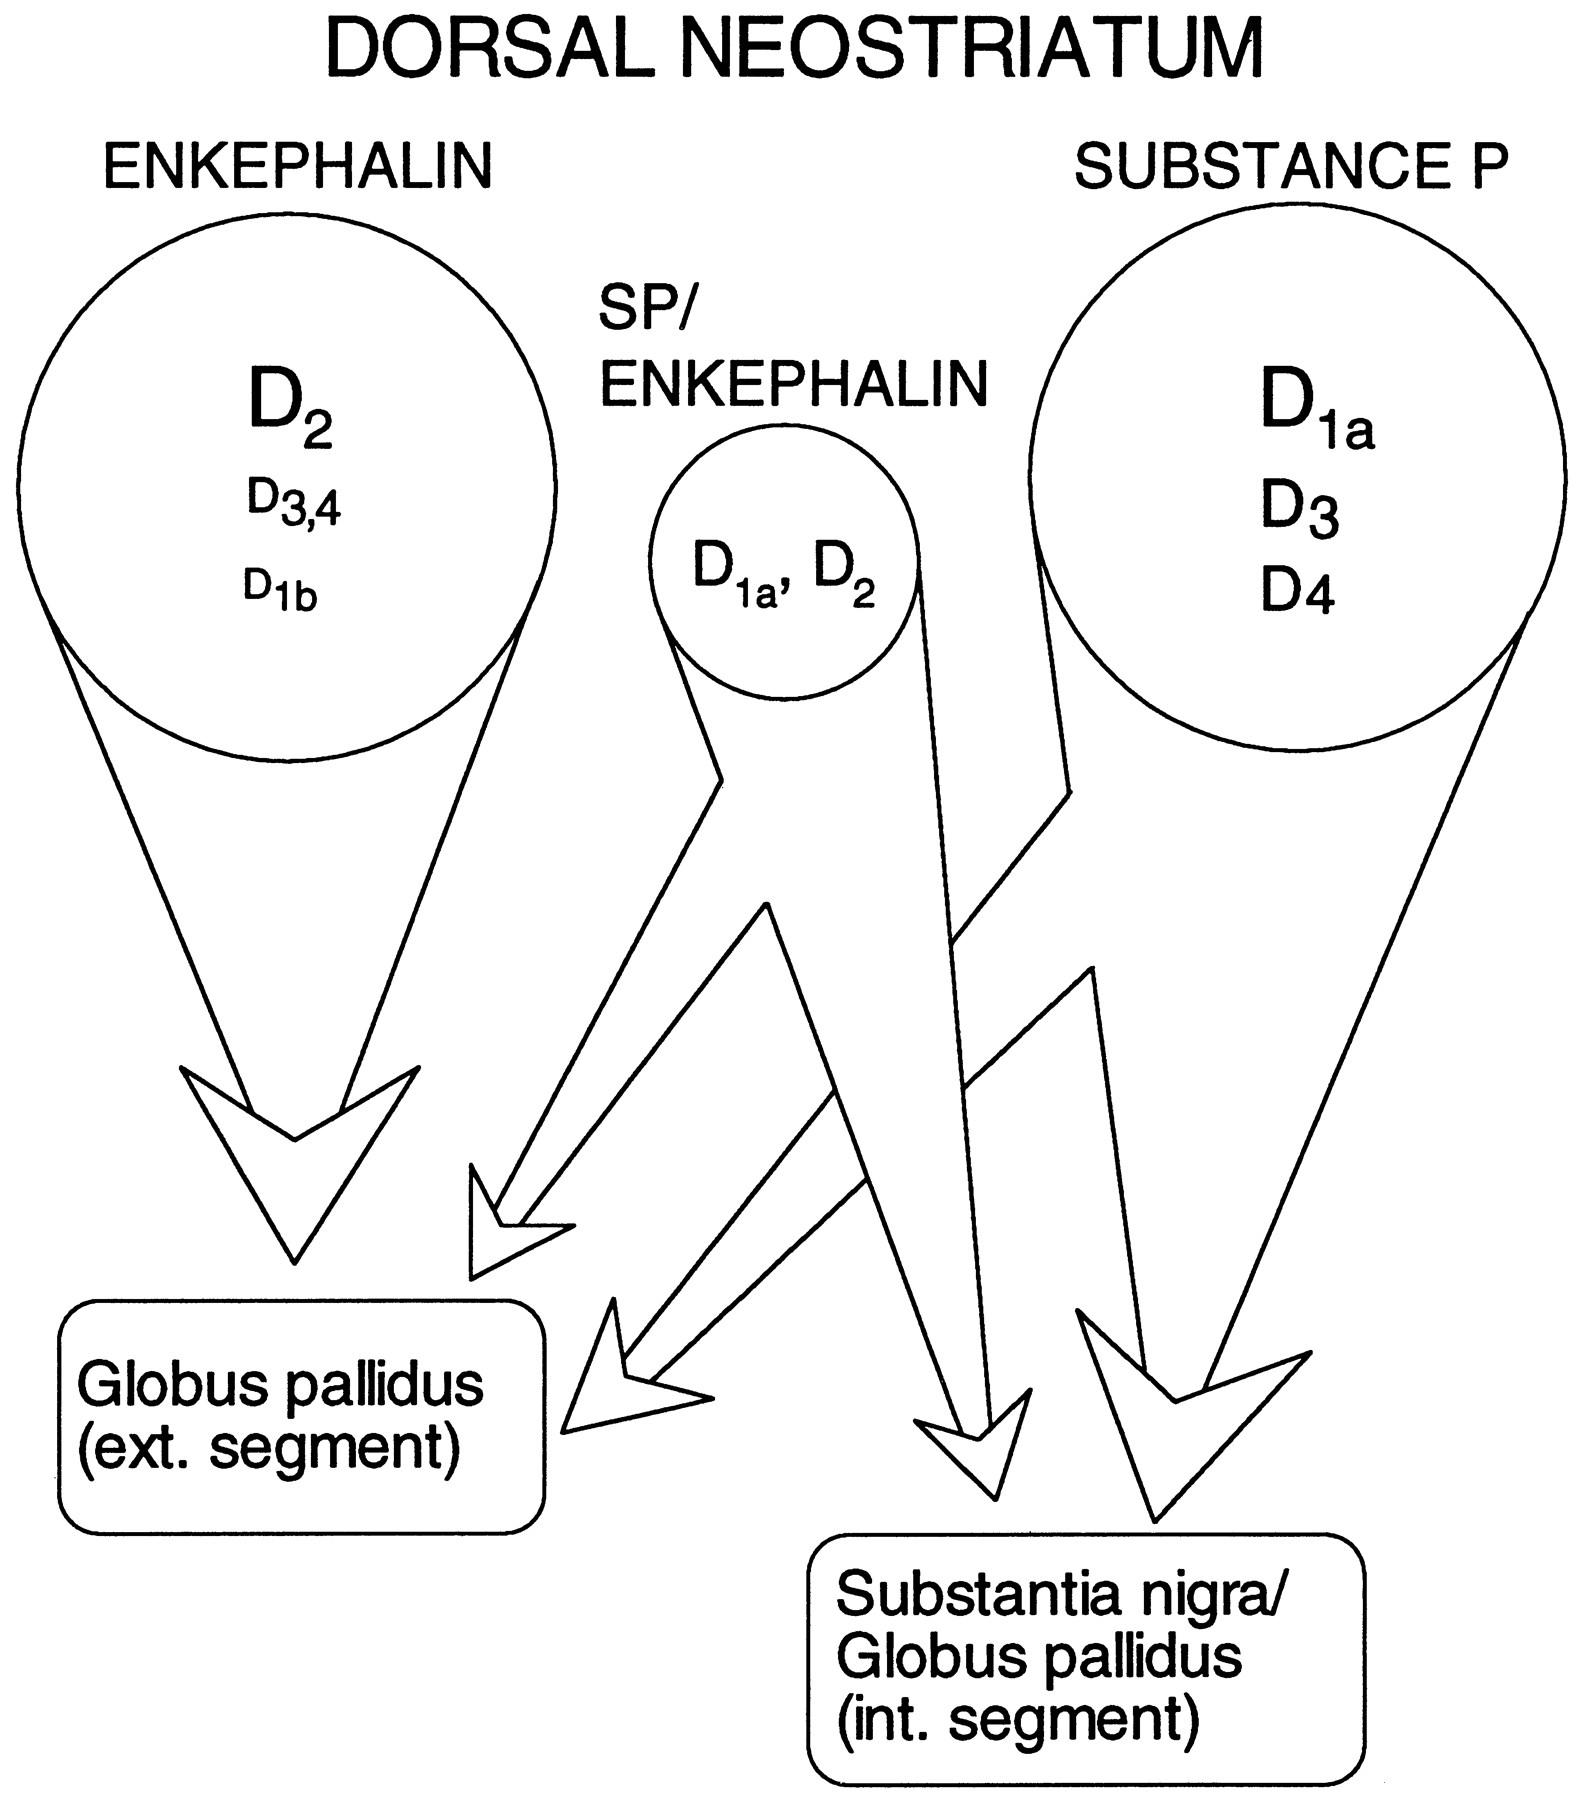 Coordinated Expression of Dopamine Receptors in Neostriatal Medium